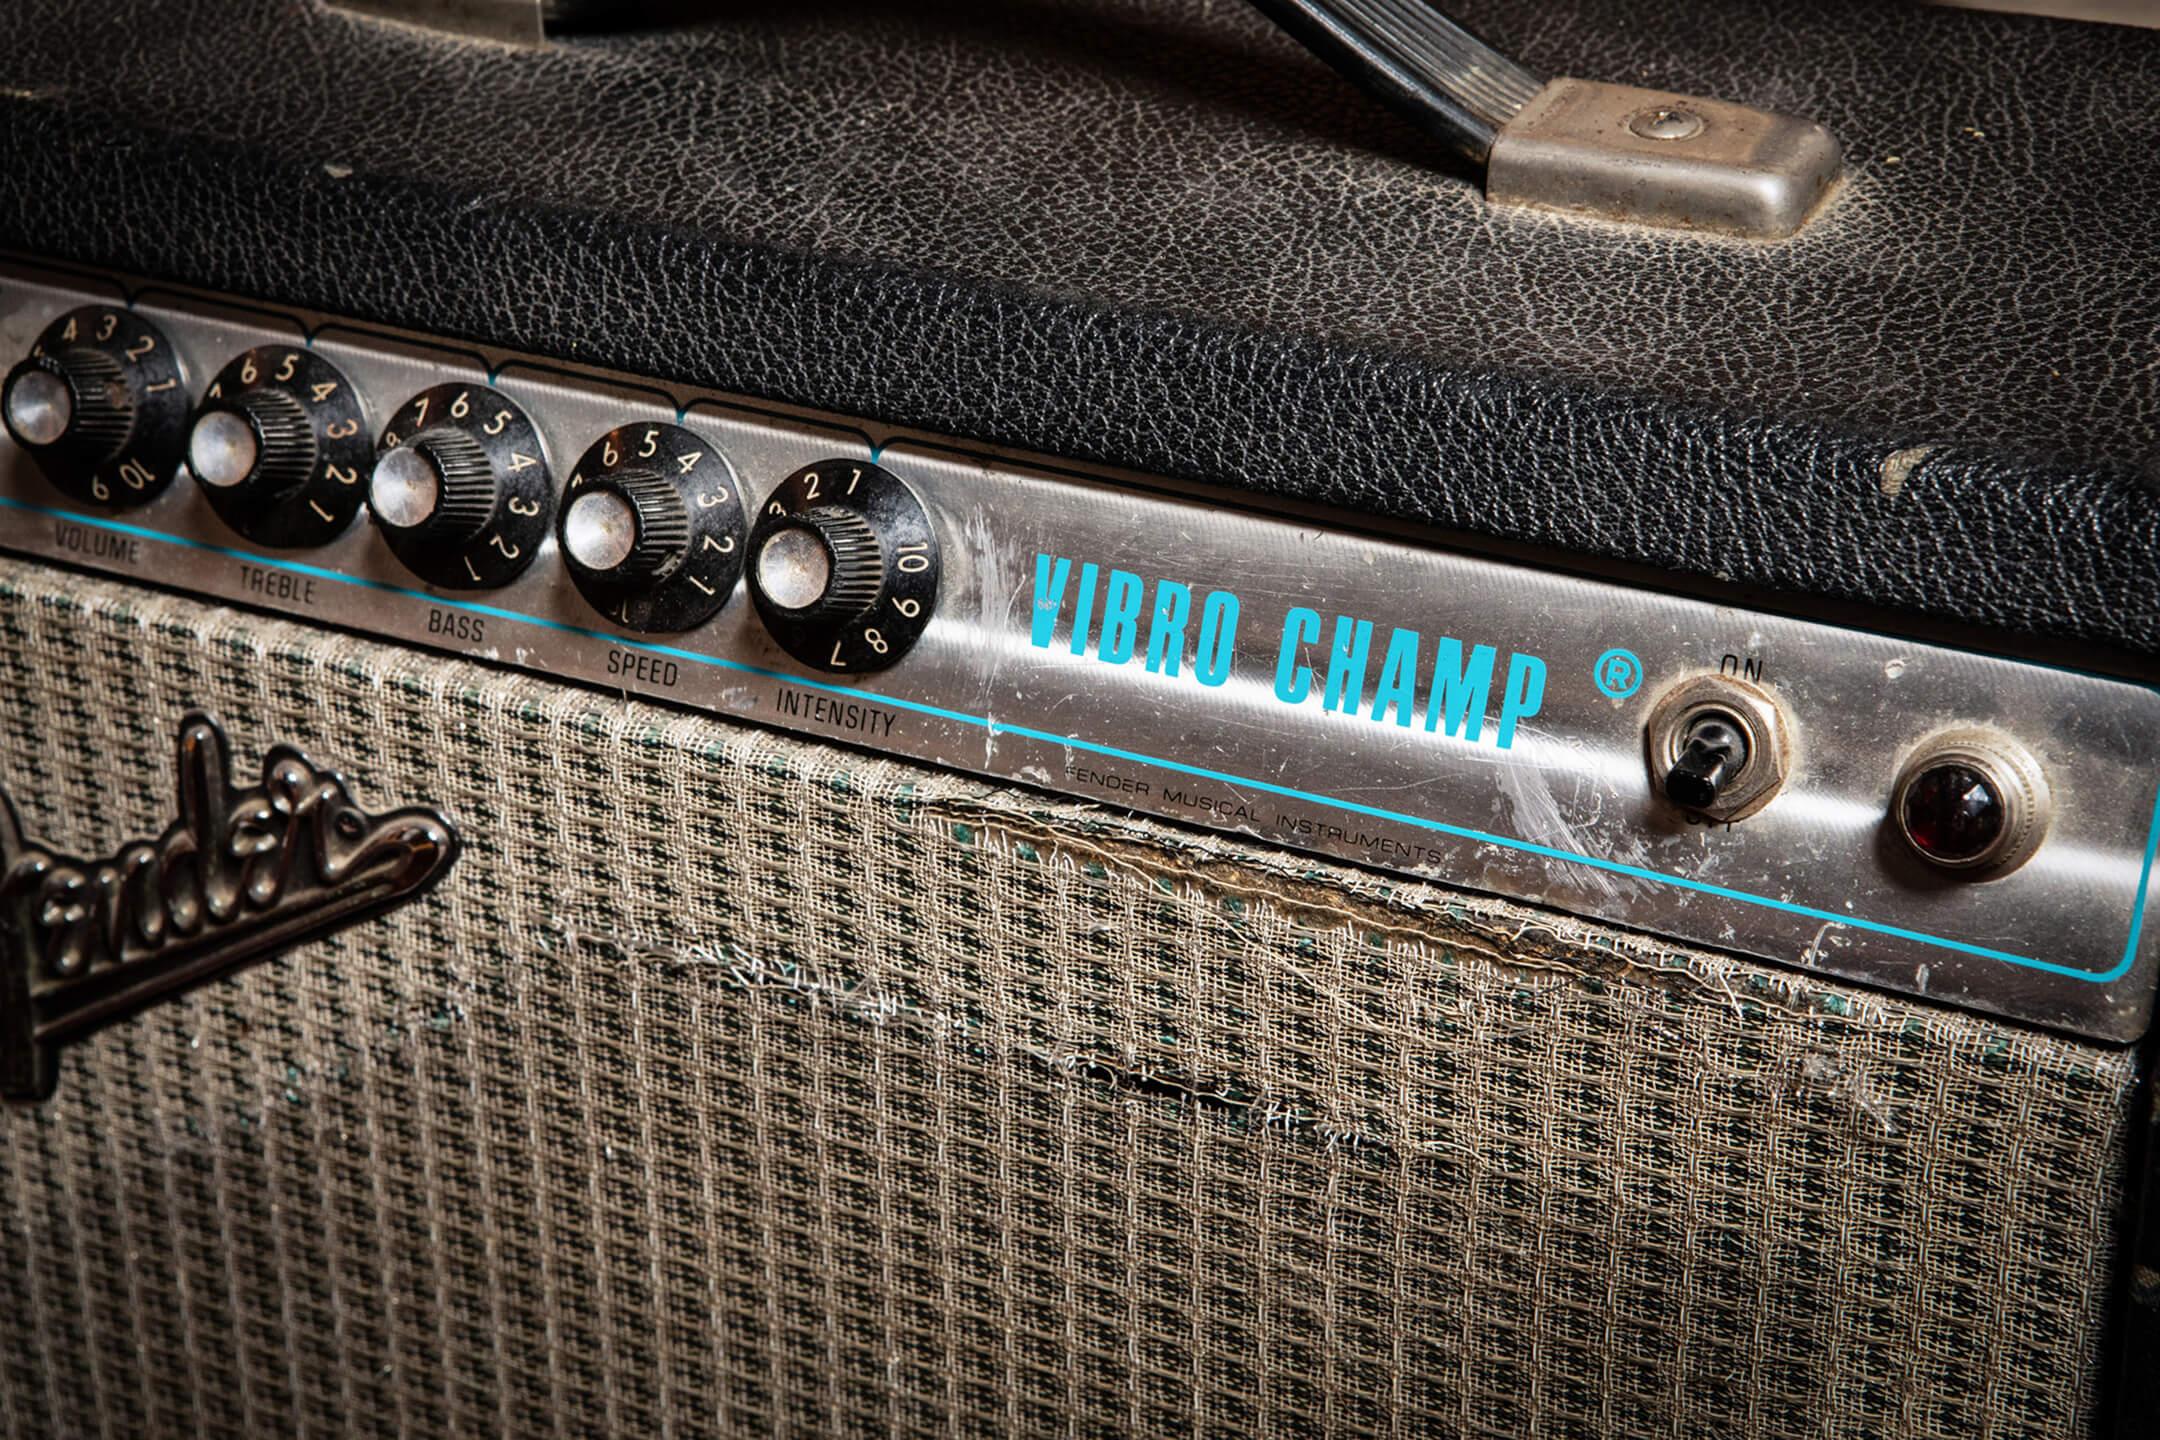 Teenage Fanclub's Fender Vibro Champ